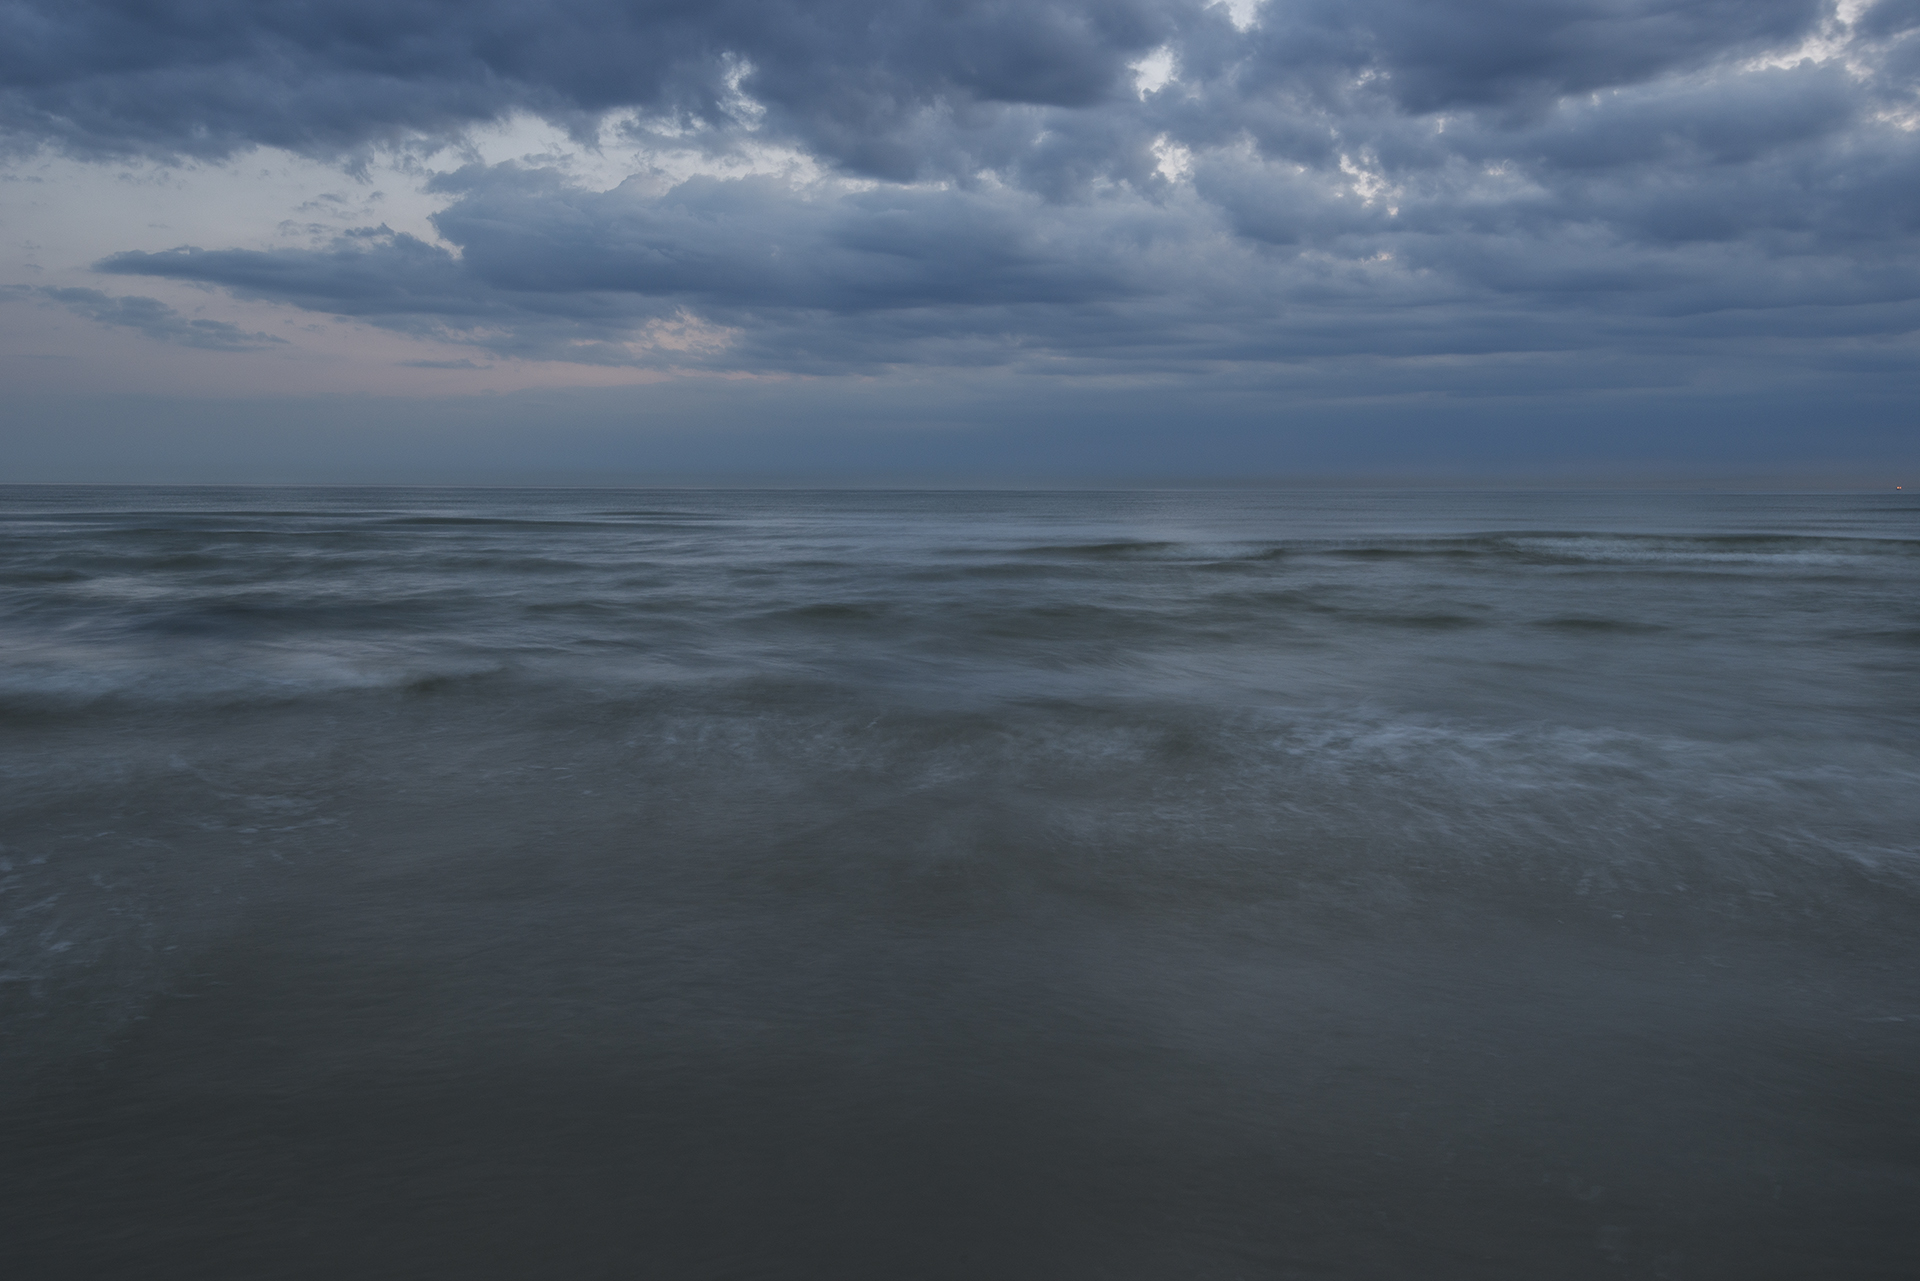 Baltic Portraits (1.5 seconds)